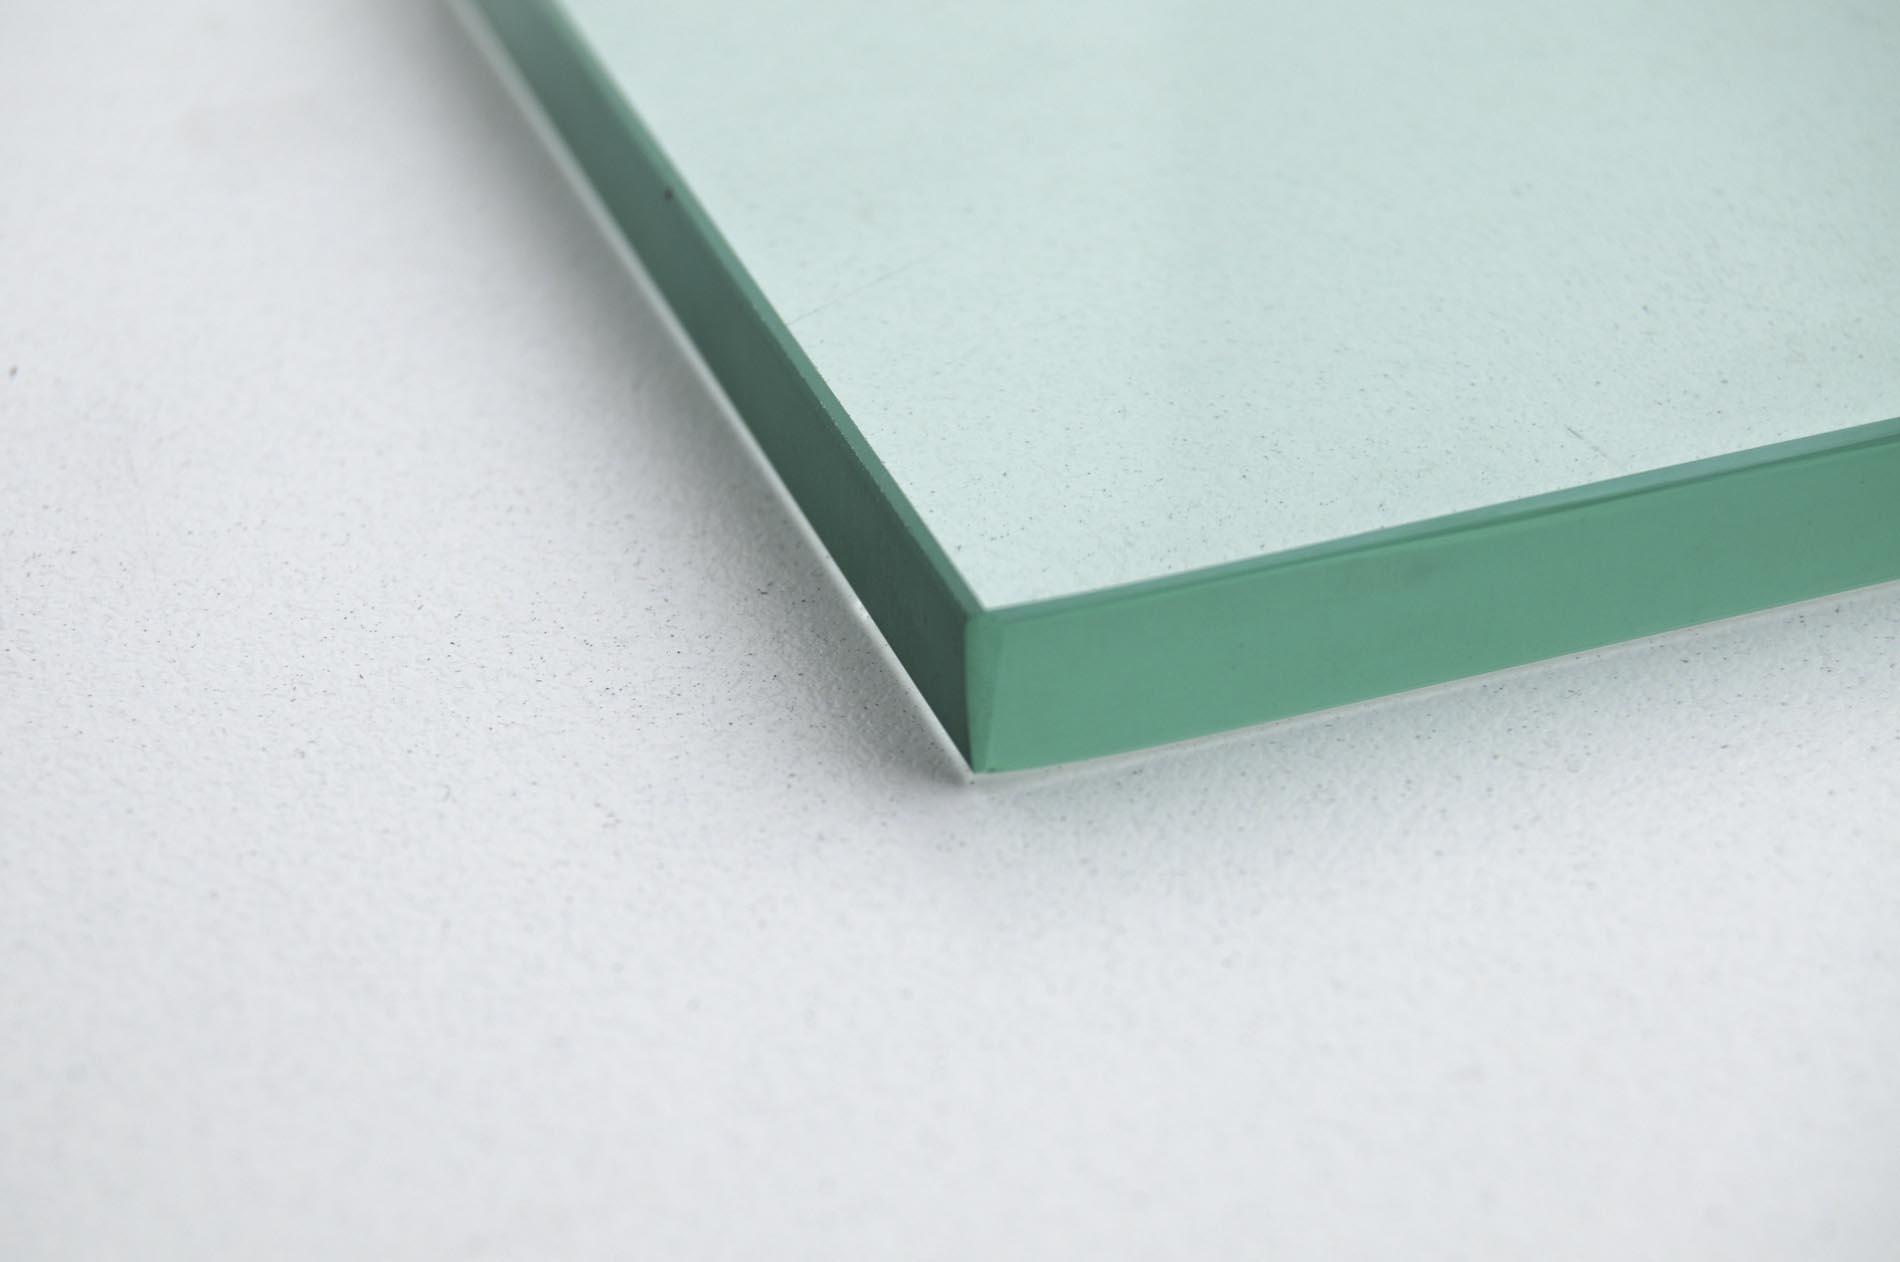 GUB0002-Base para aplanar pie cepillos vidrio 500x100x10 GUB0002-max-2.